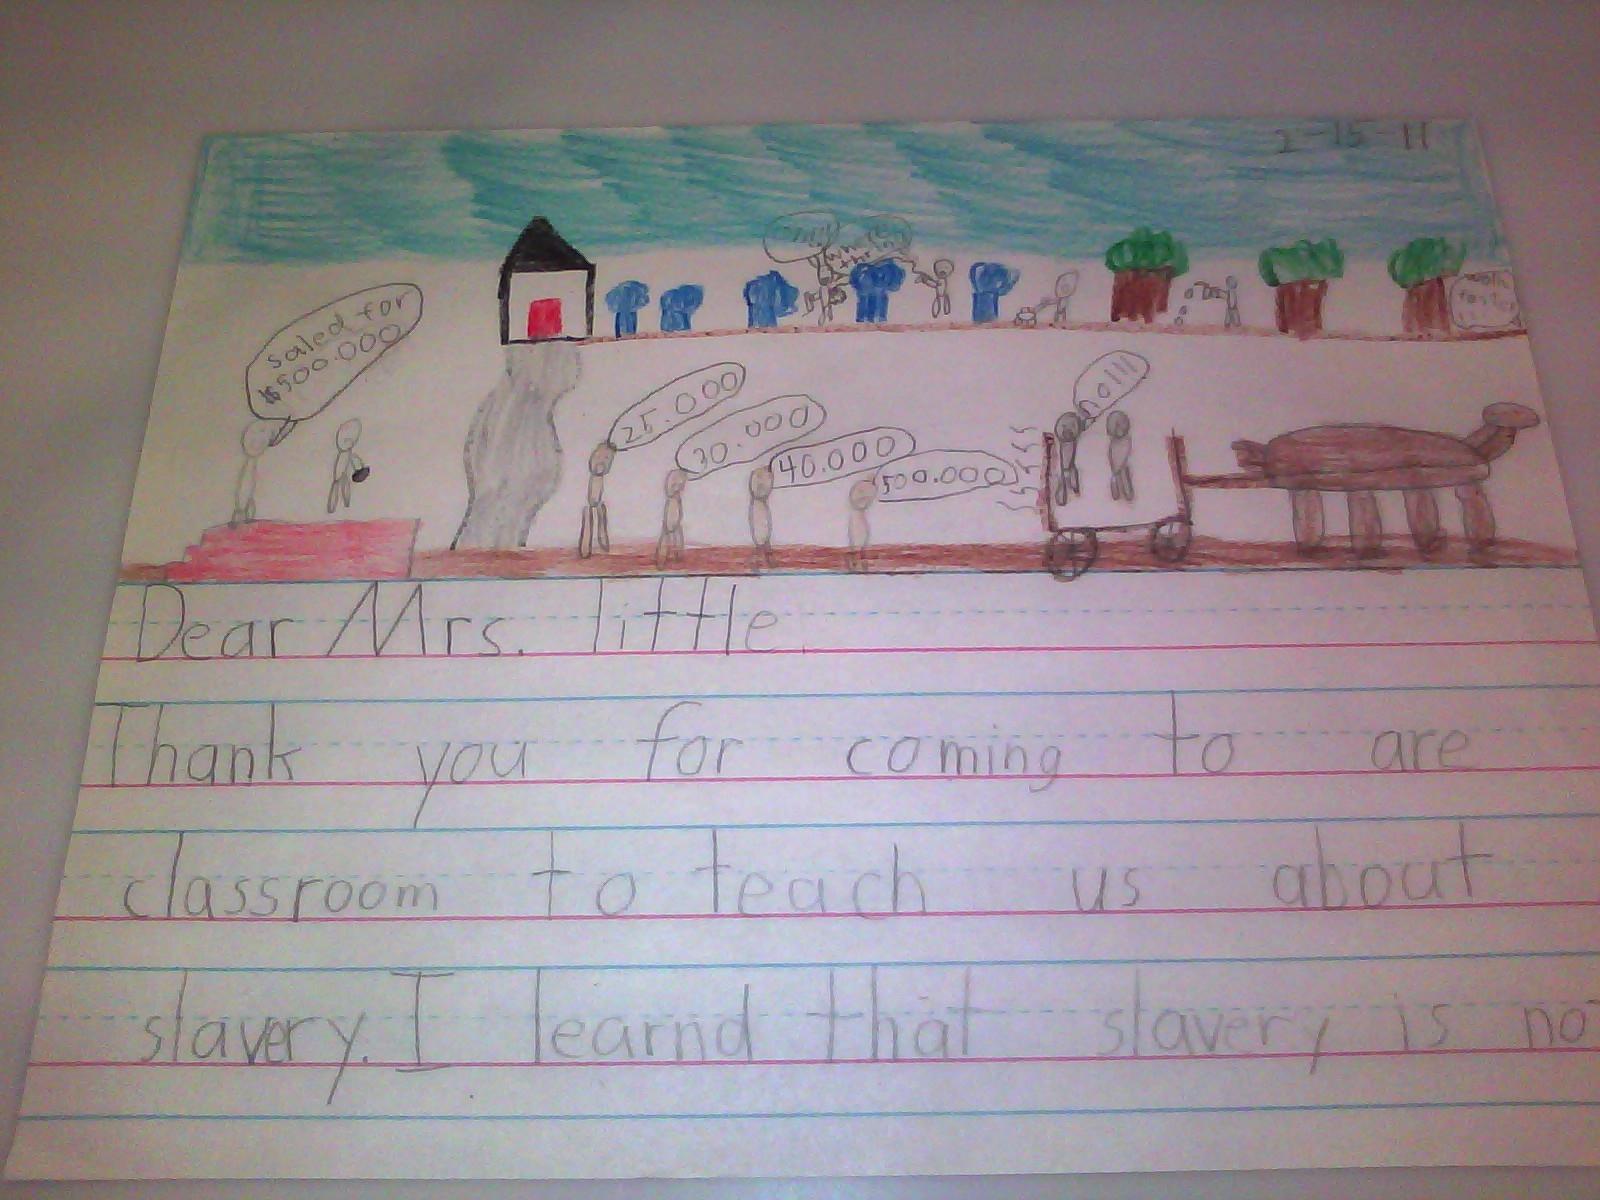 American Slavery In The Elementary School Classroom